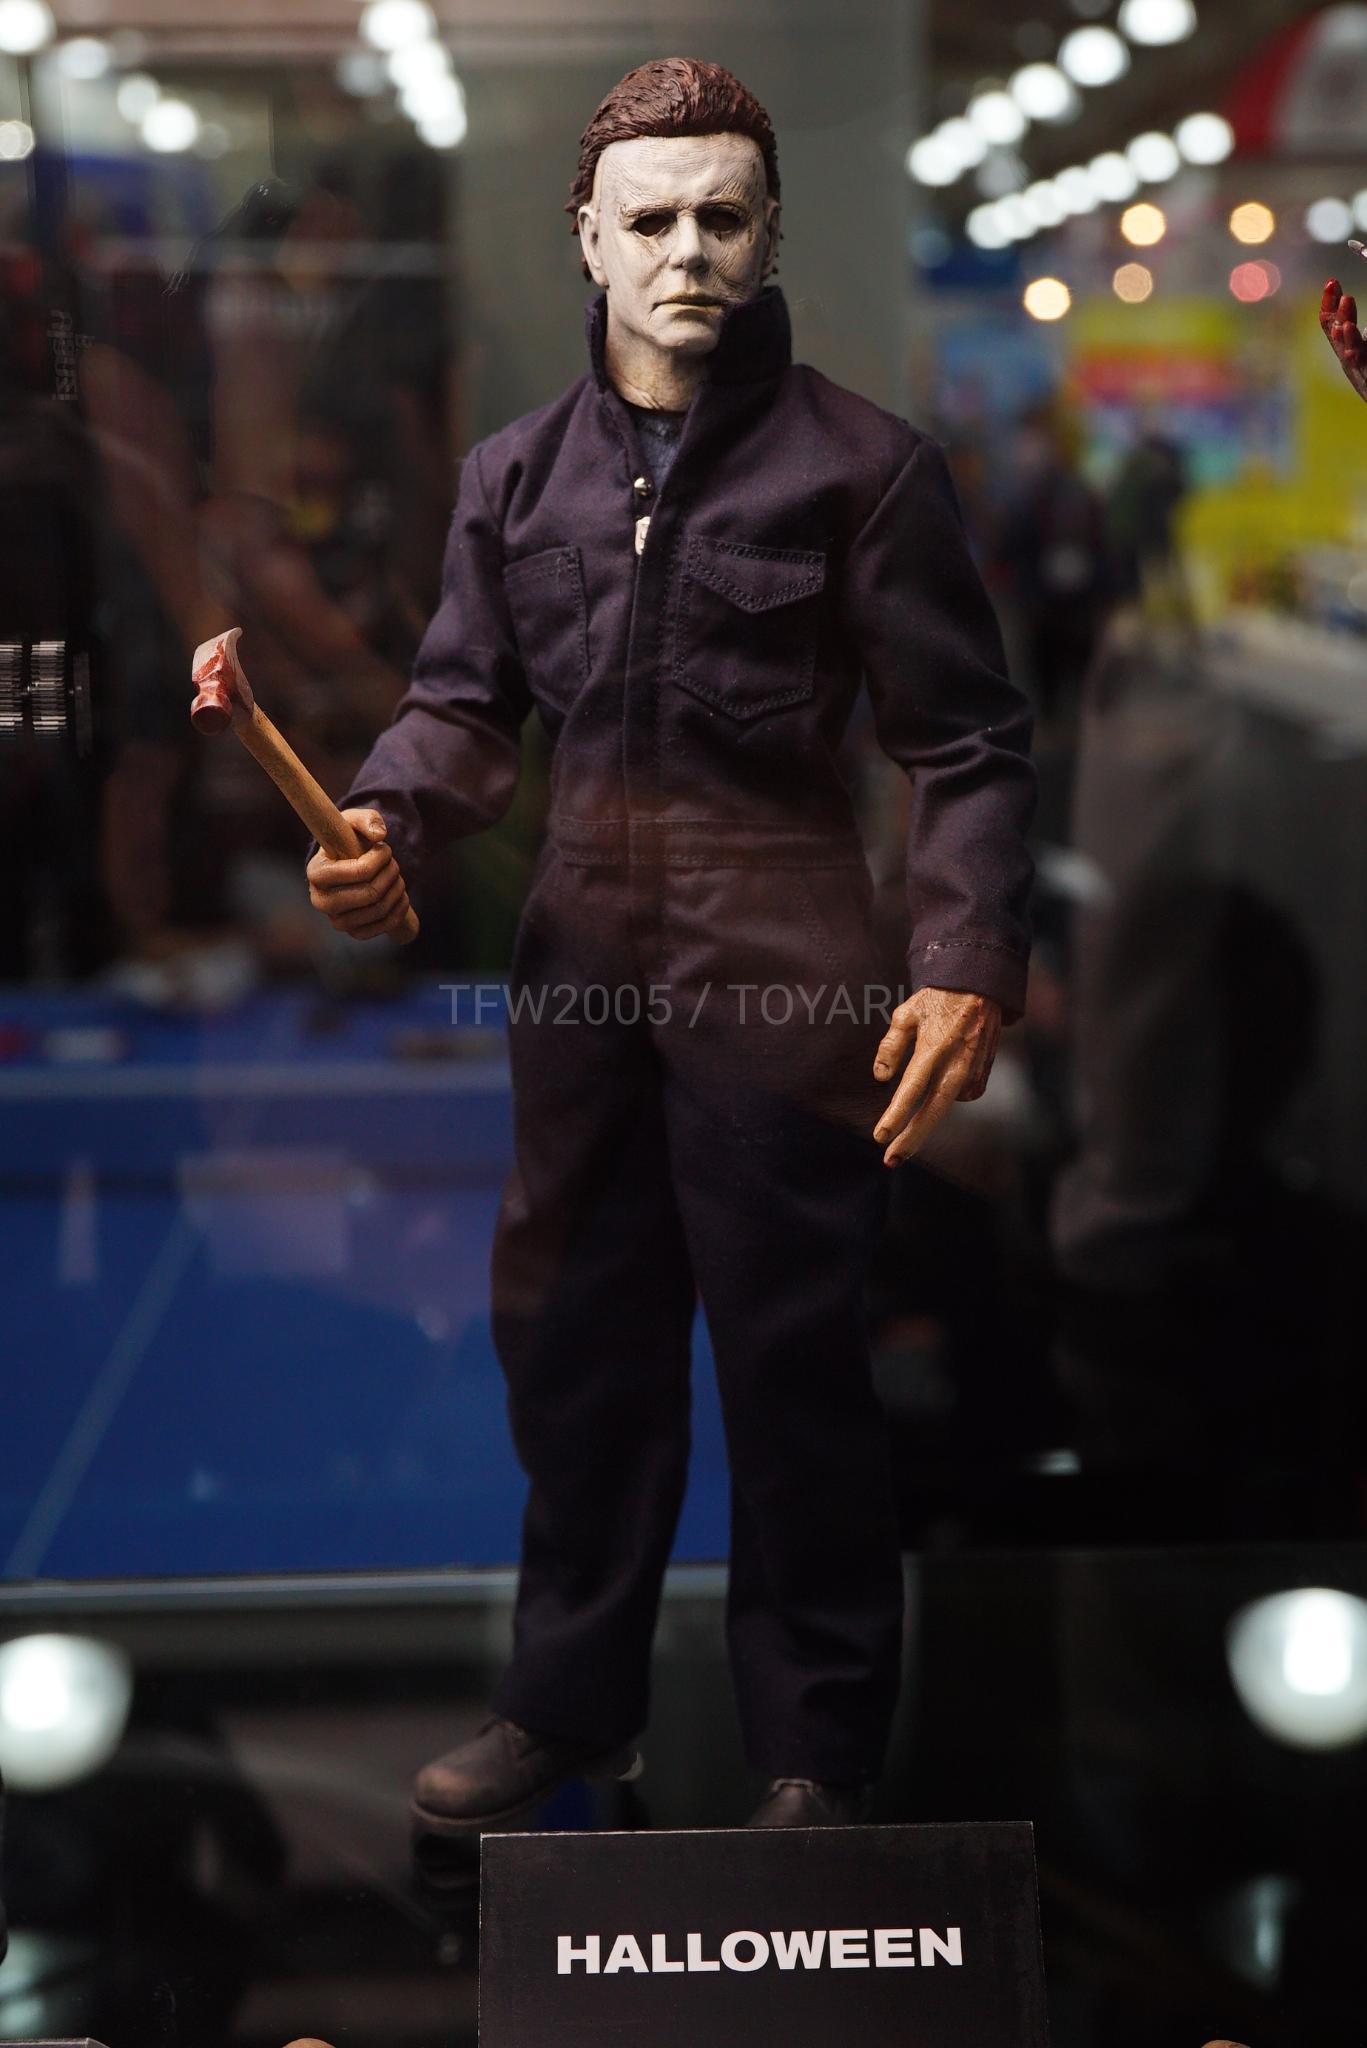 Toy-Fair-2020-Trick-or-Treat-Studios-004